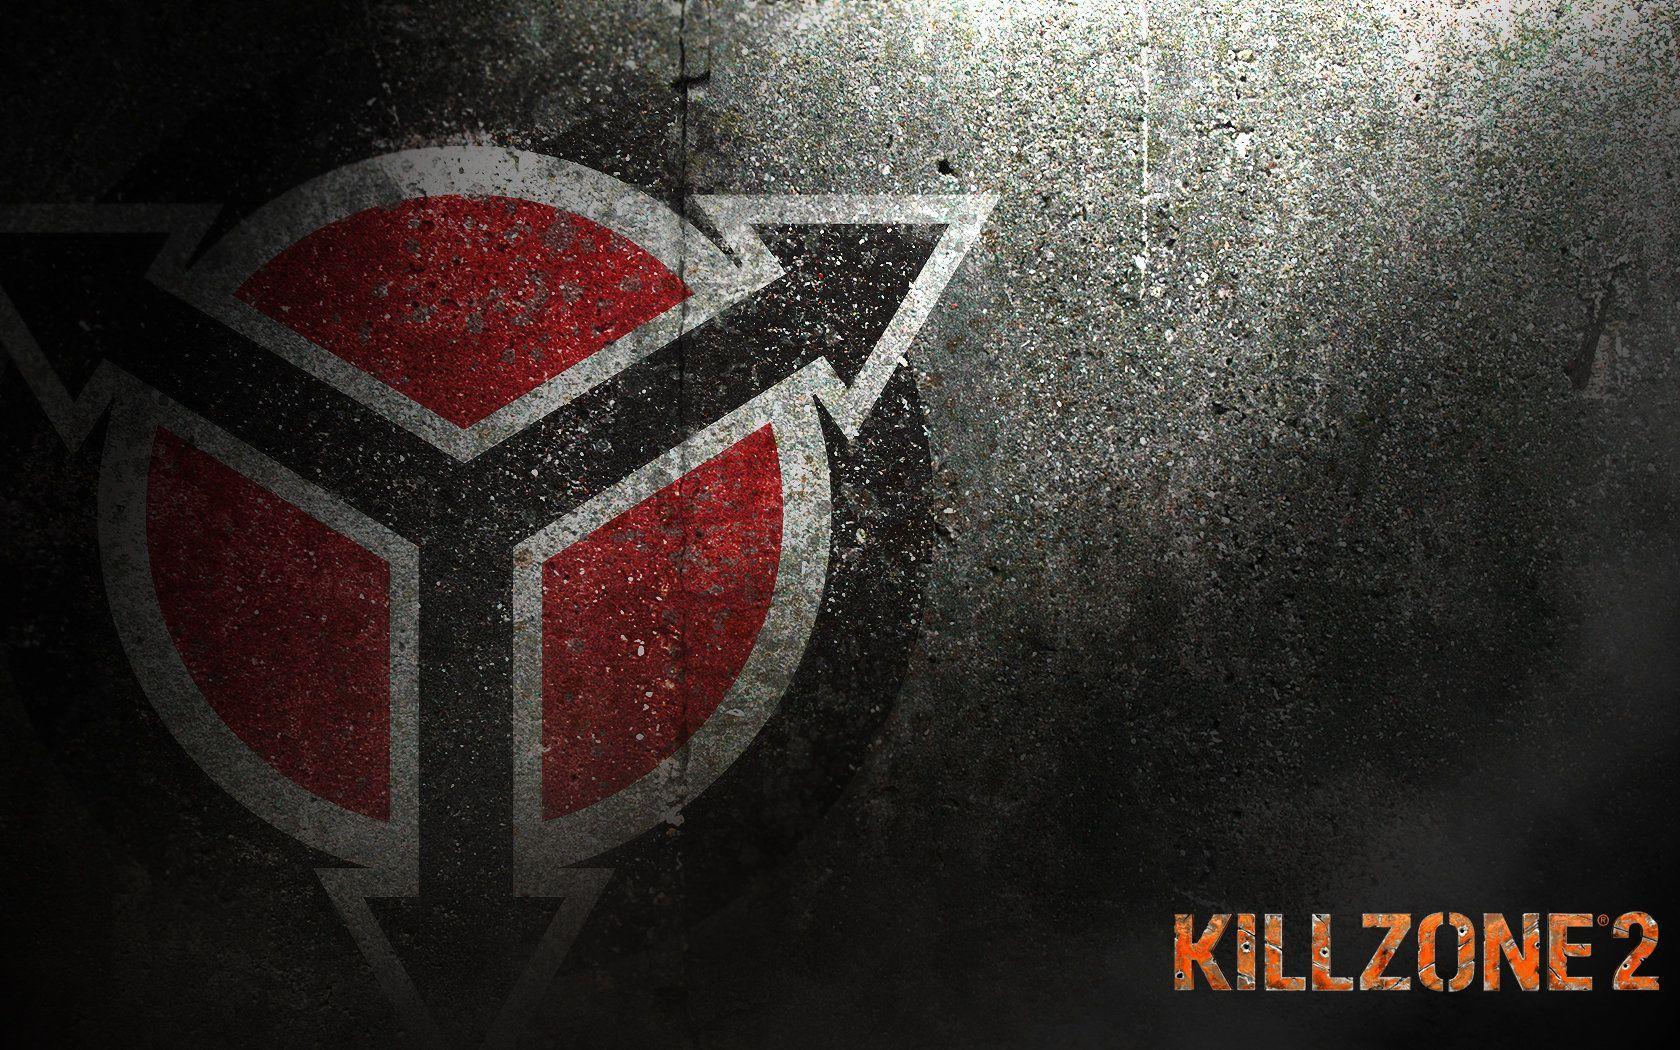 Killzone 3 Helghast Wallpapers Wallpaper Cave